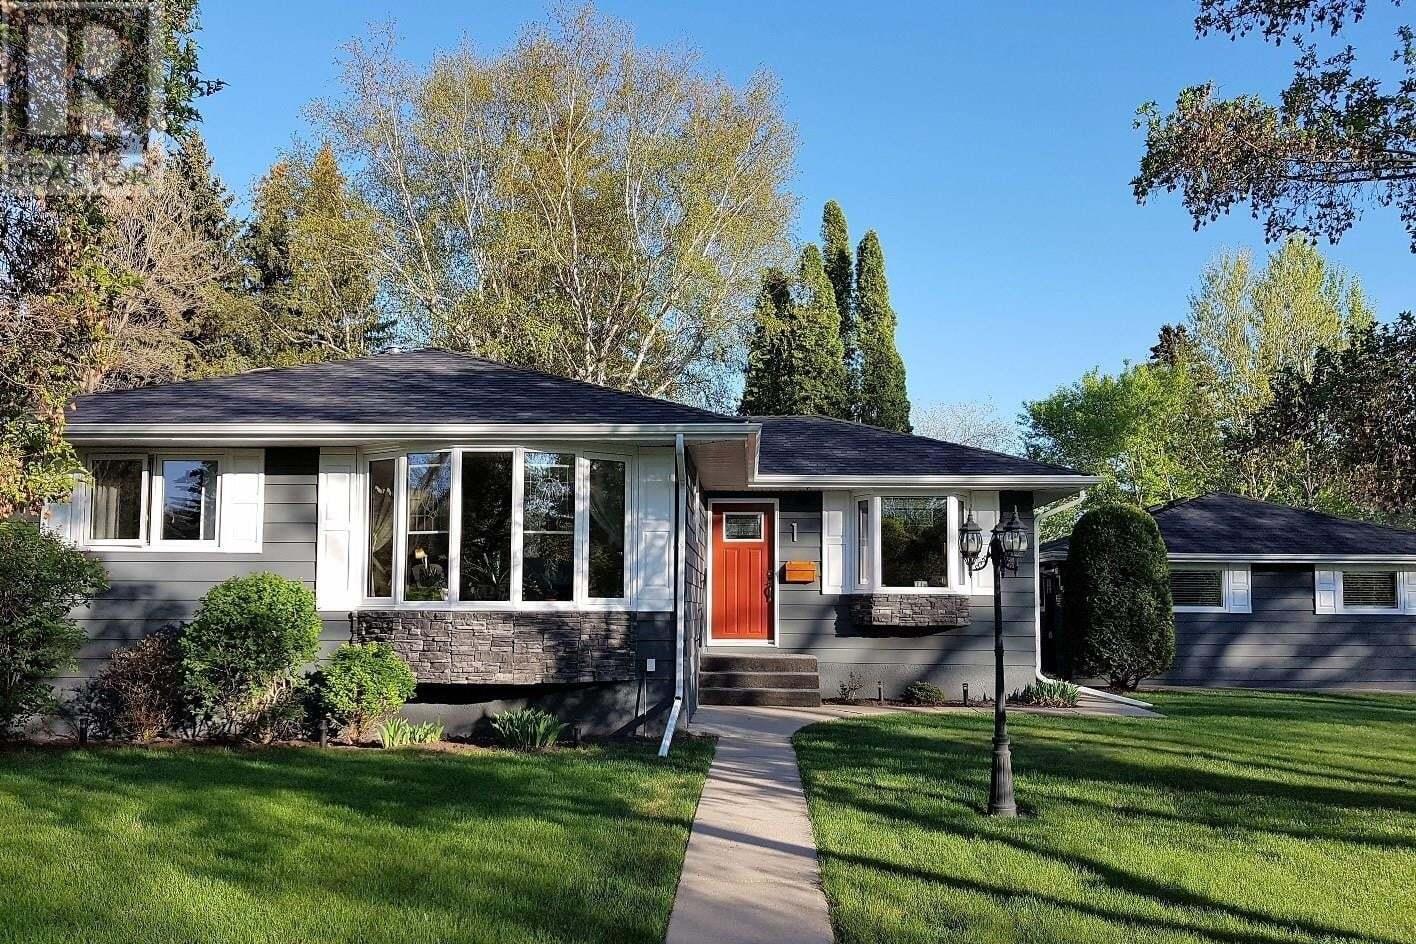 House for sale at 1 Pinder Cres Saskatoon Saskatchewan - MLS: SK810328